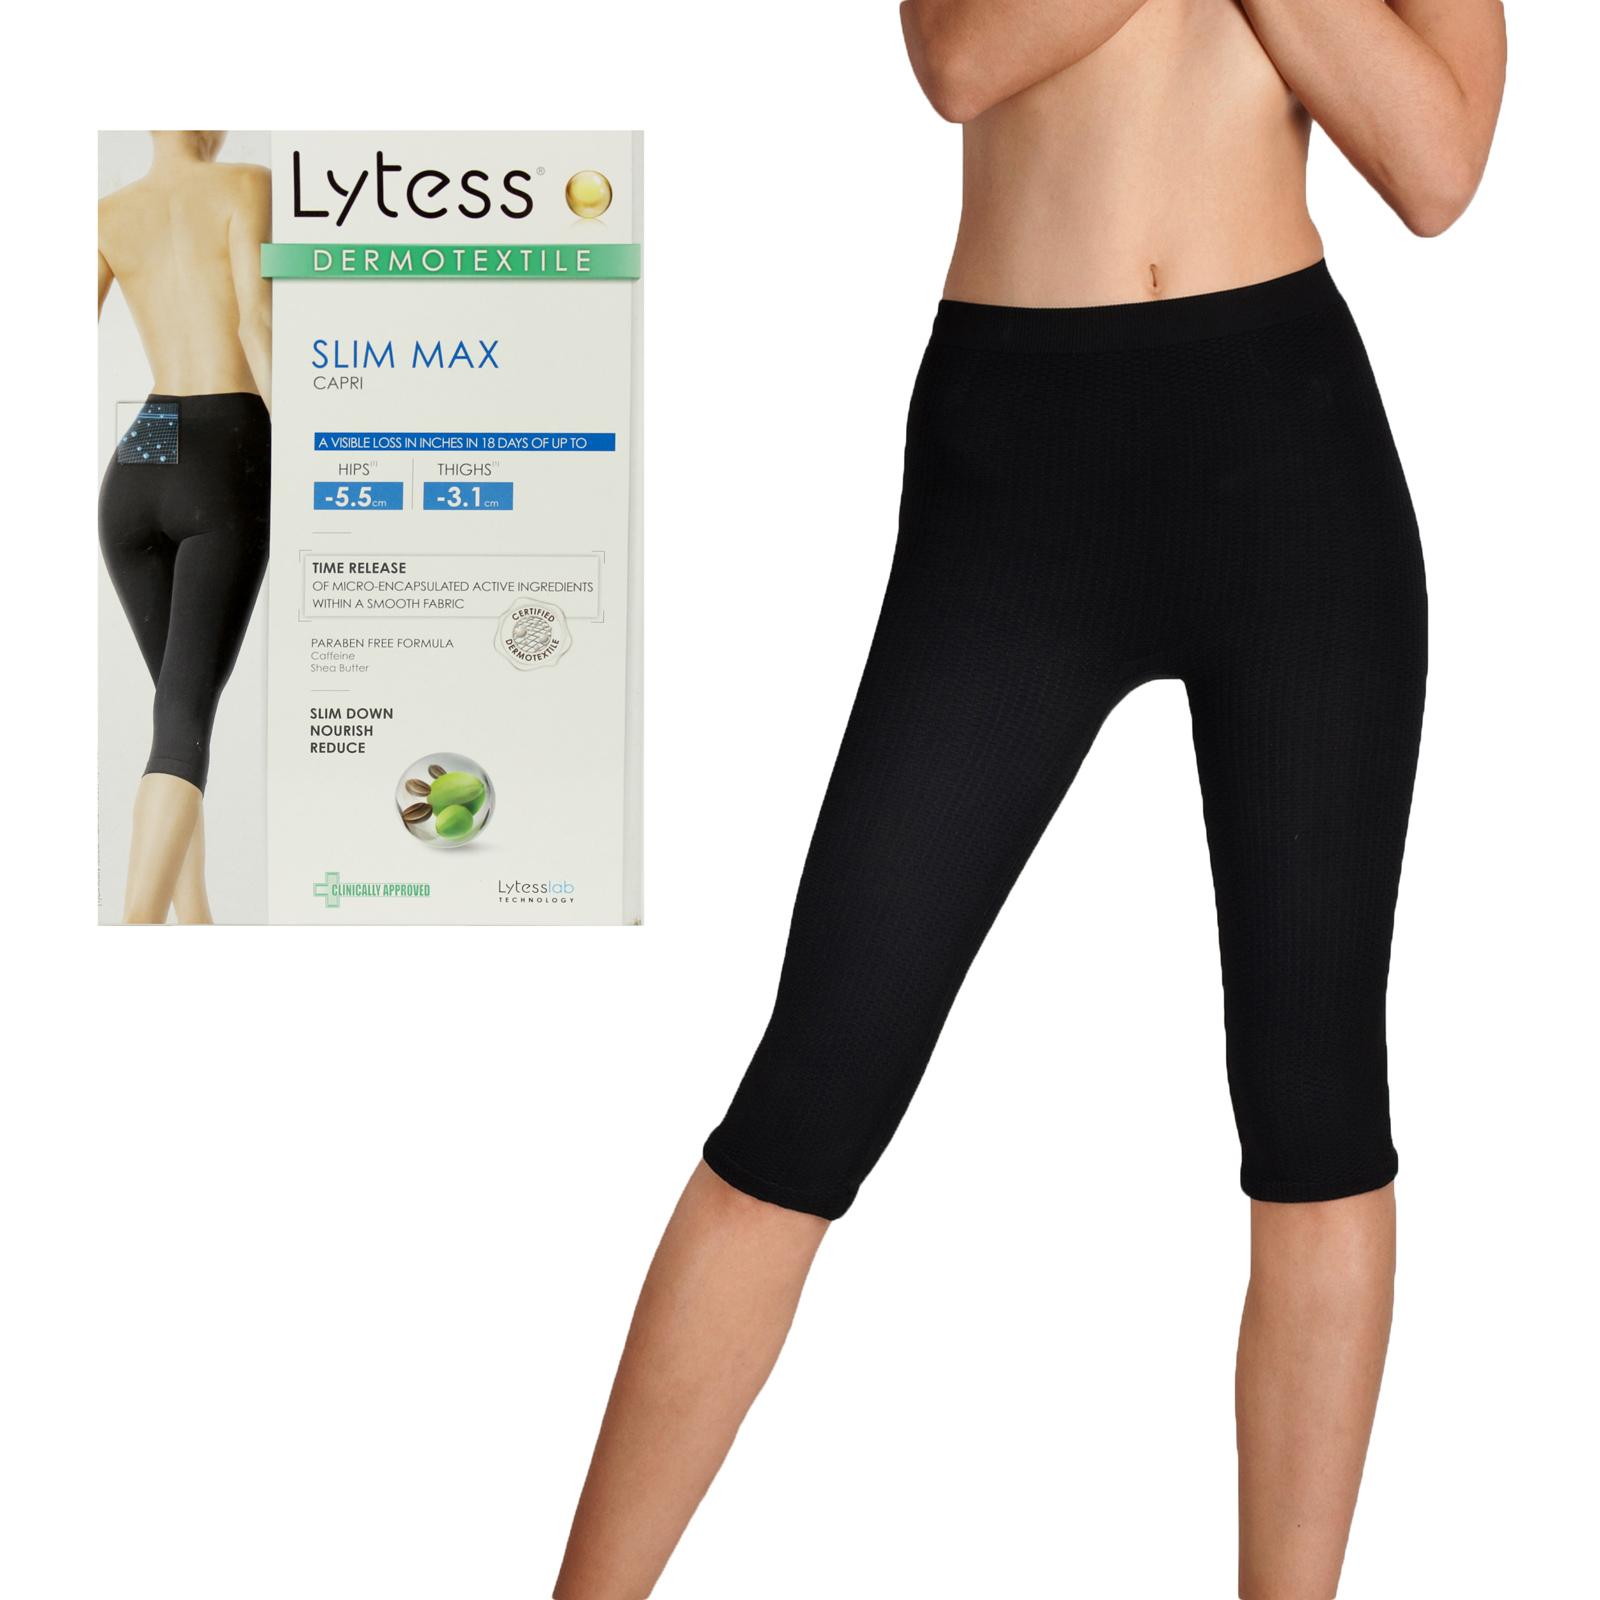 d68a32d78e Body Shaper Lytess Slim Max Waist Slimming Thigh Underwear Capri ...